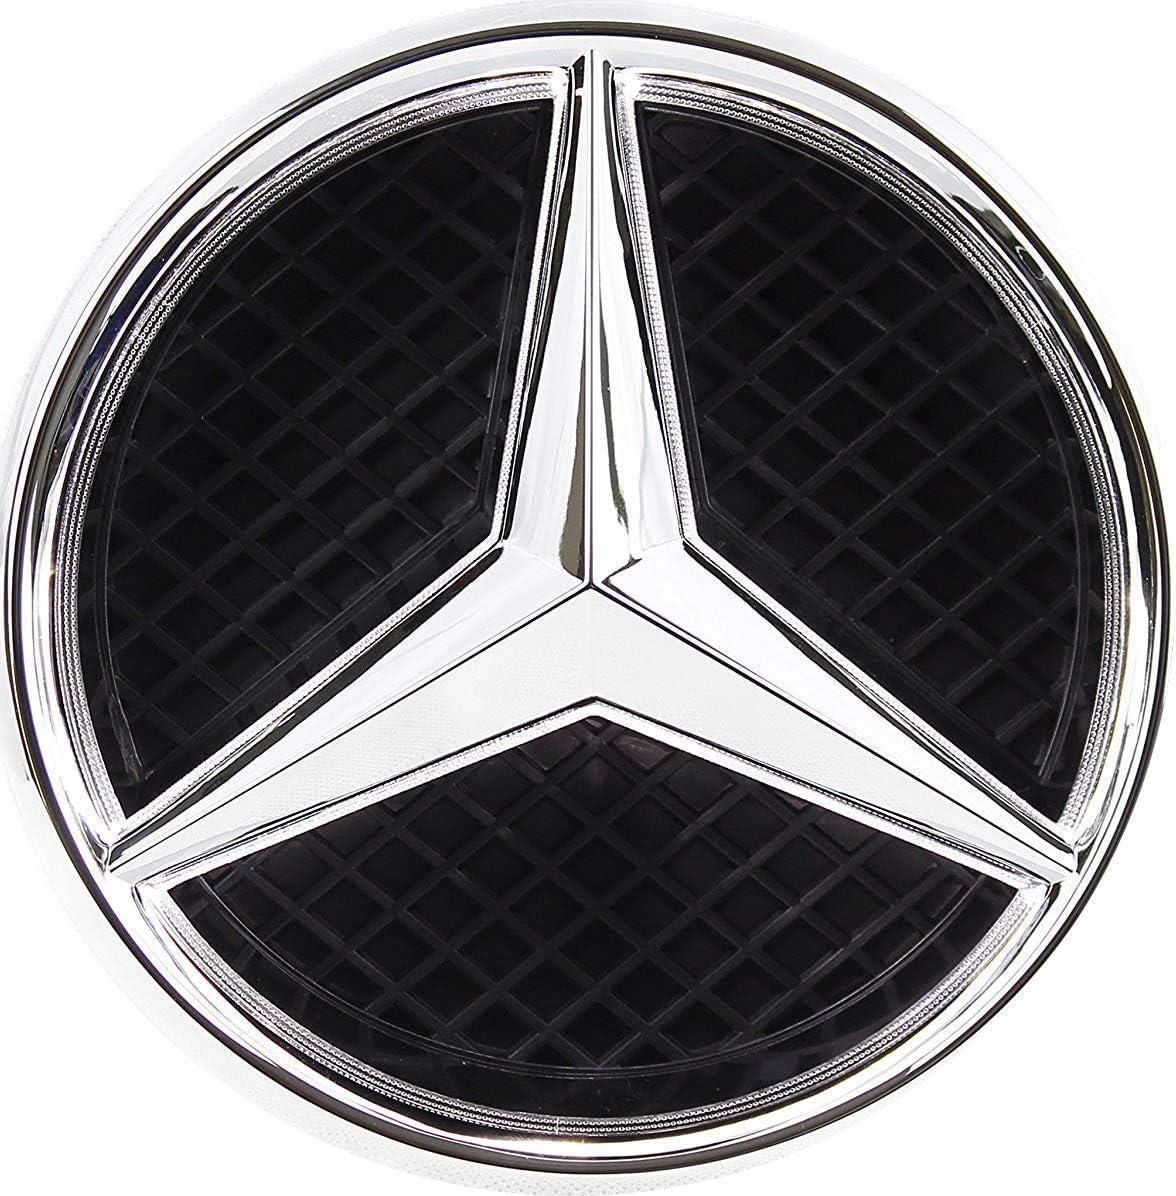 Multicolor, not transparent grid Bearfire Fit Benz Emblem Led Badge Light Car Star Logo Glow Front Grill Illuminated Logo Hood Star DRL